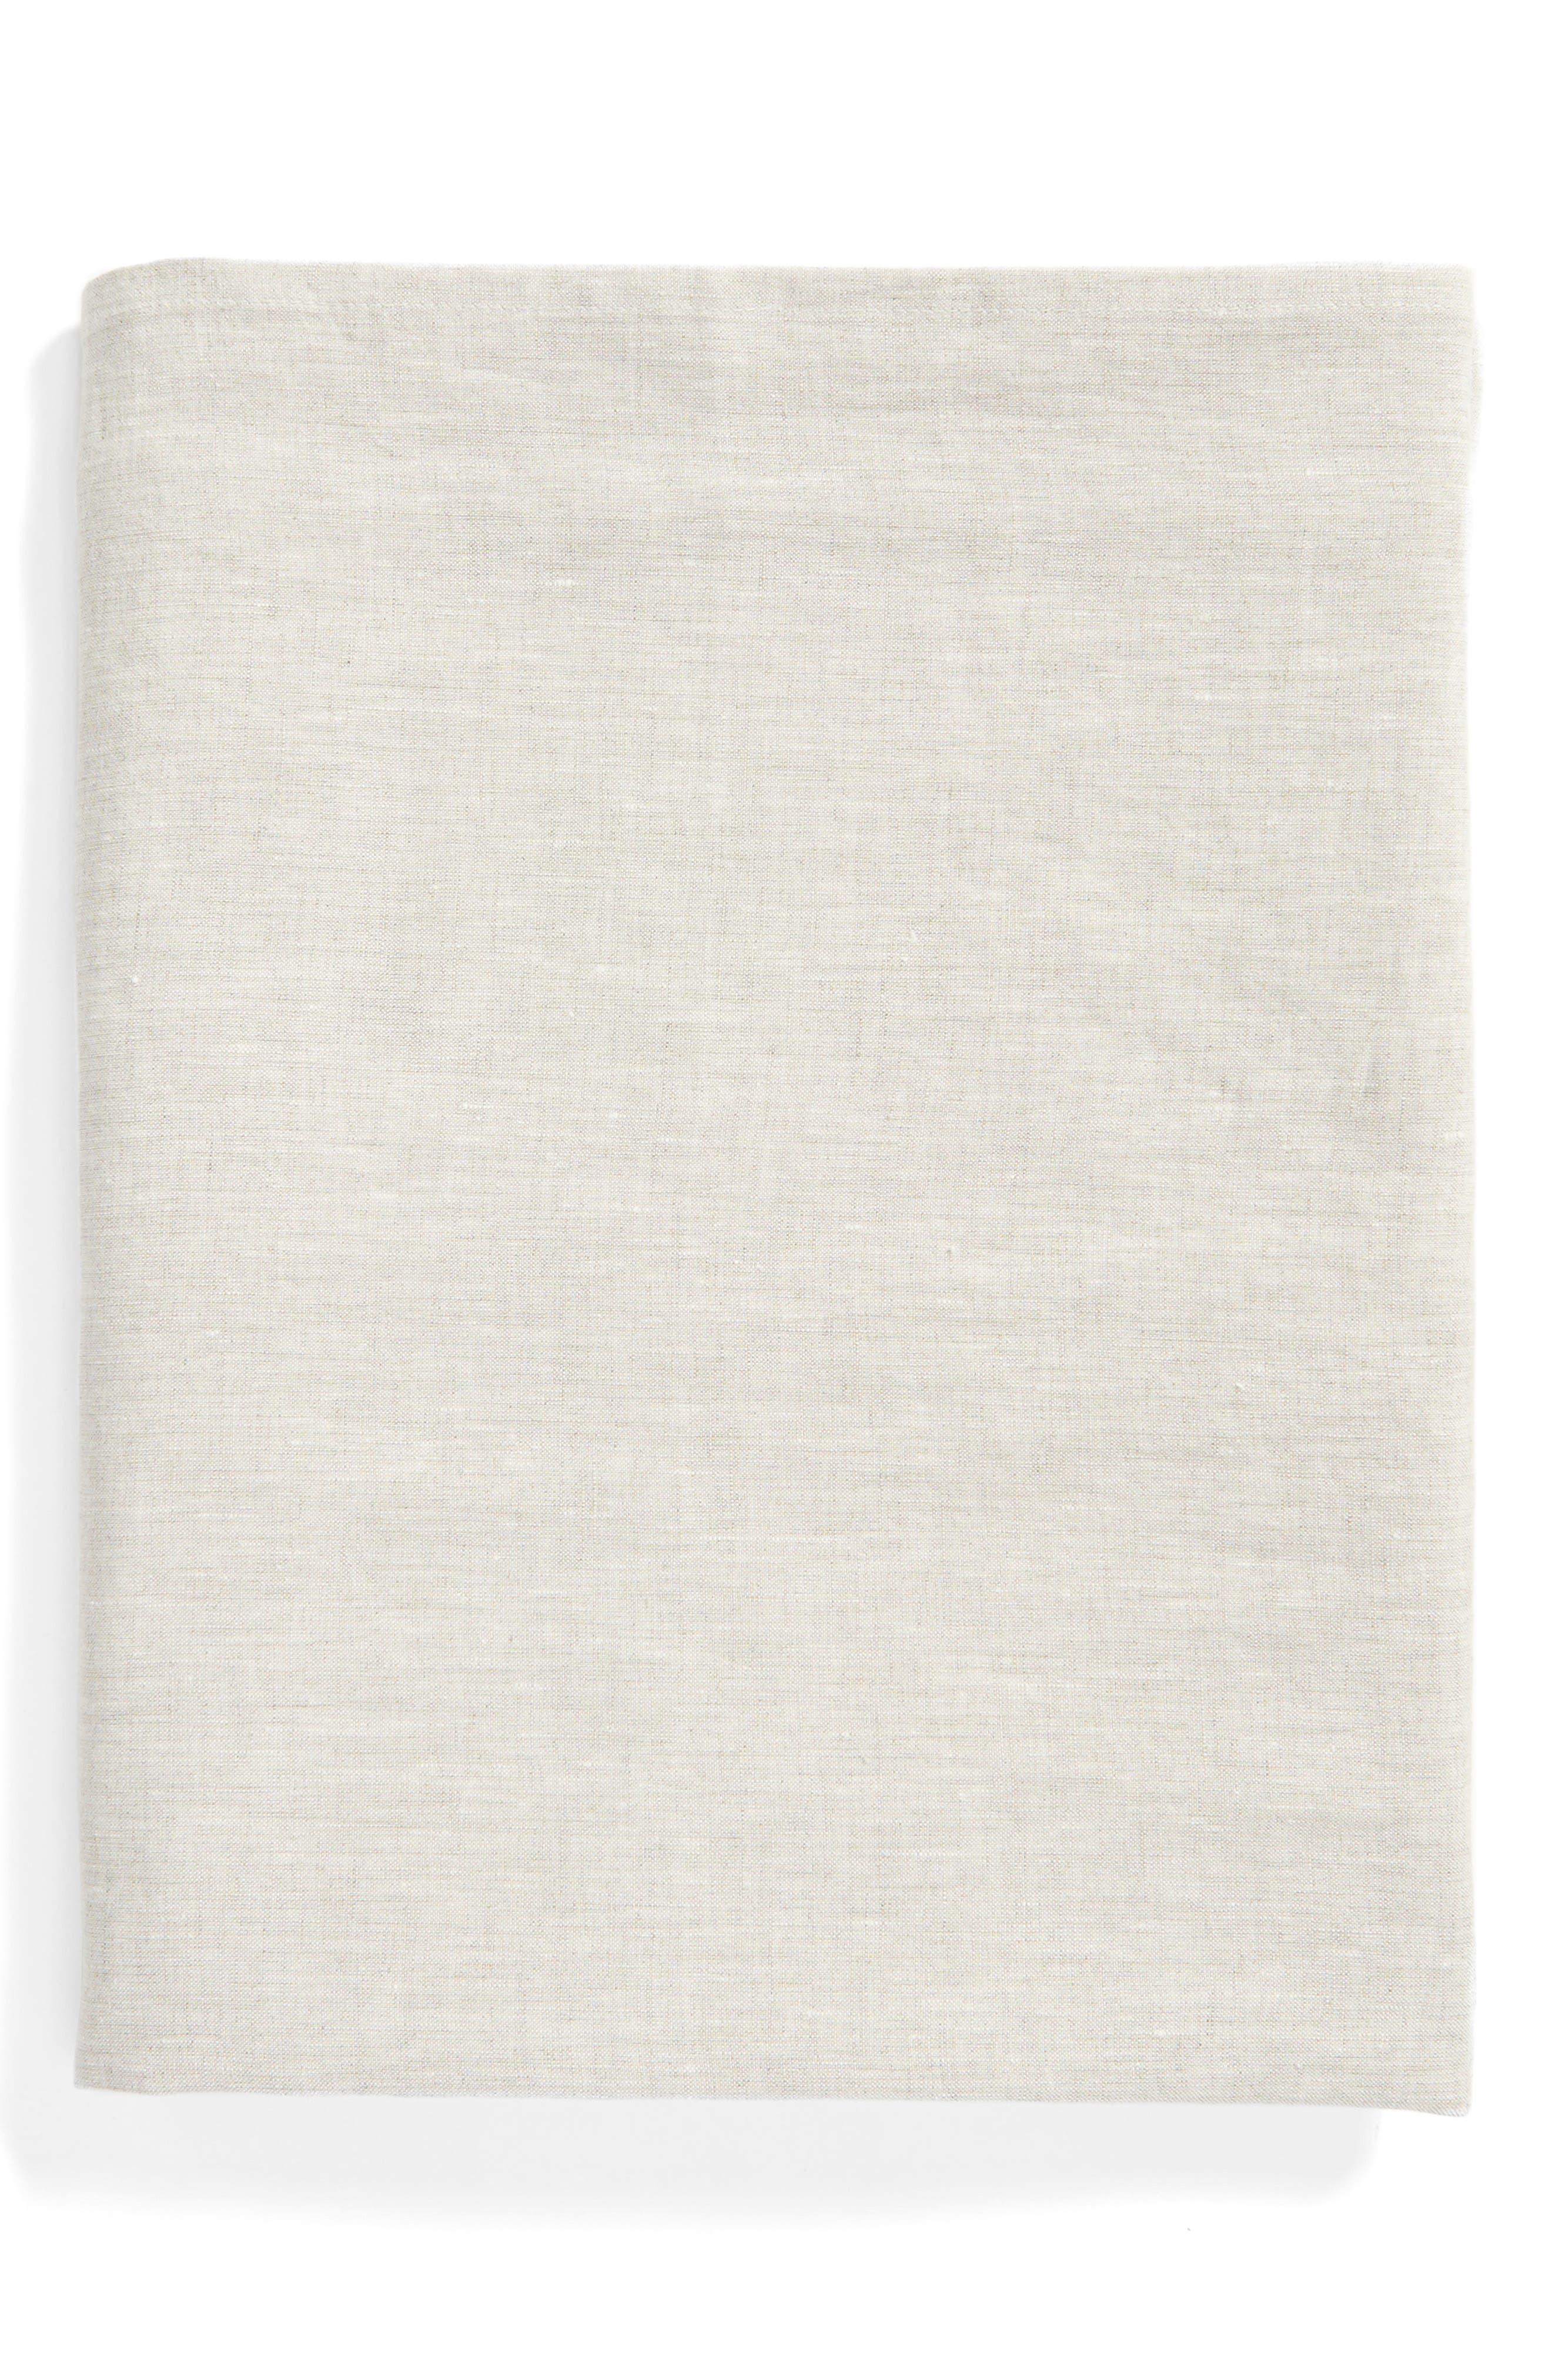 Washed Linen Tablecloth,                             Main thumbnail 3, color,